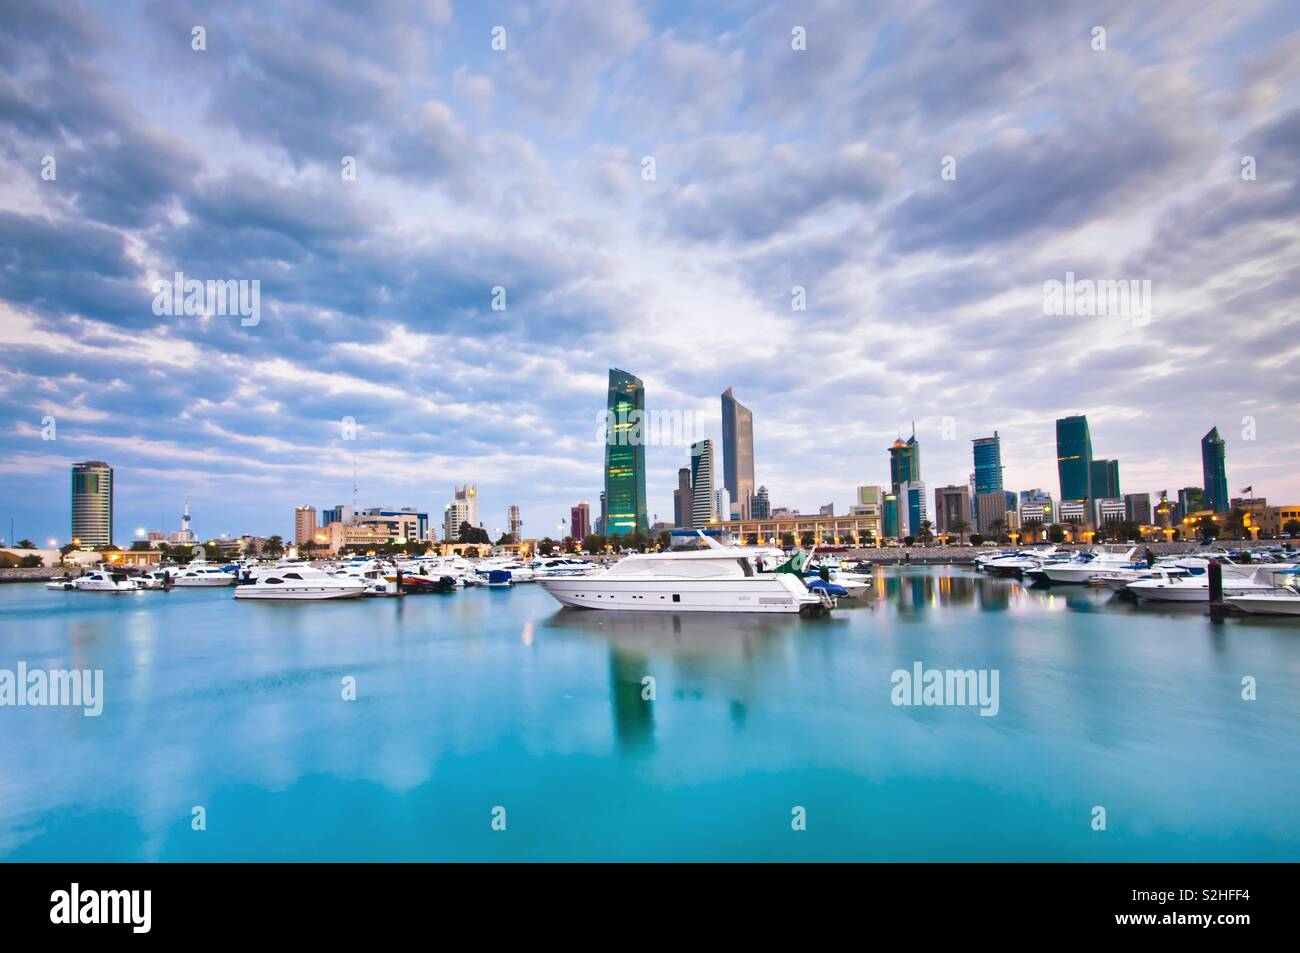 Kuwait City Clouds - Stock Image